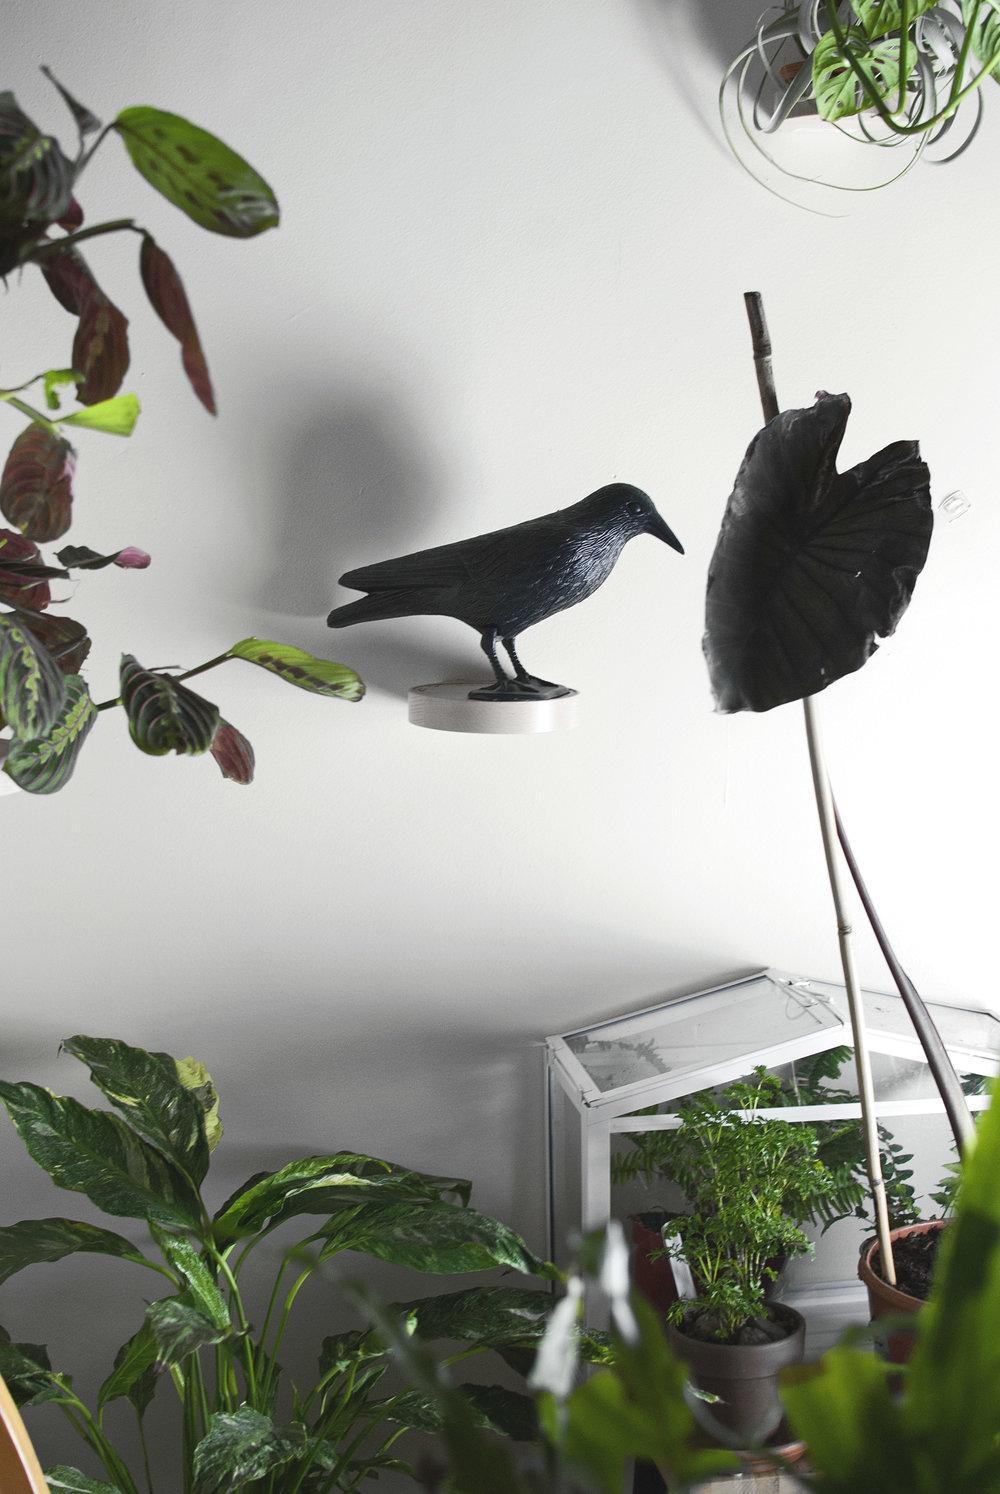 Halloween houseplant decor in an apartment jungle, including a  Colocasia esculenta.